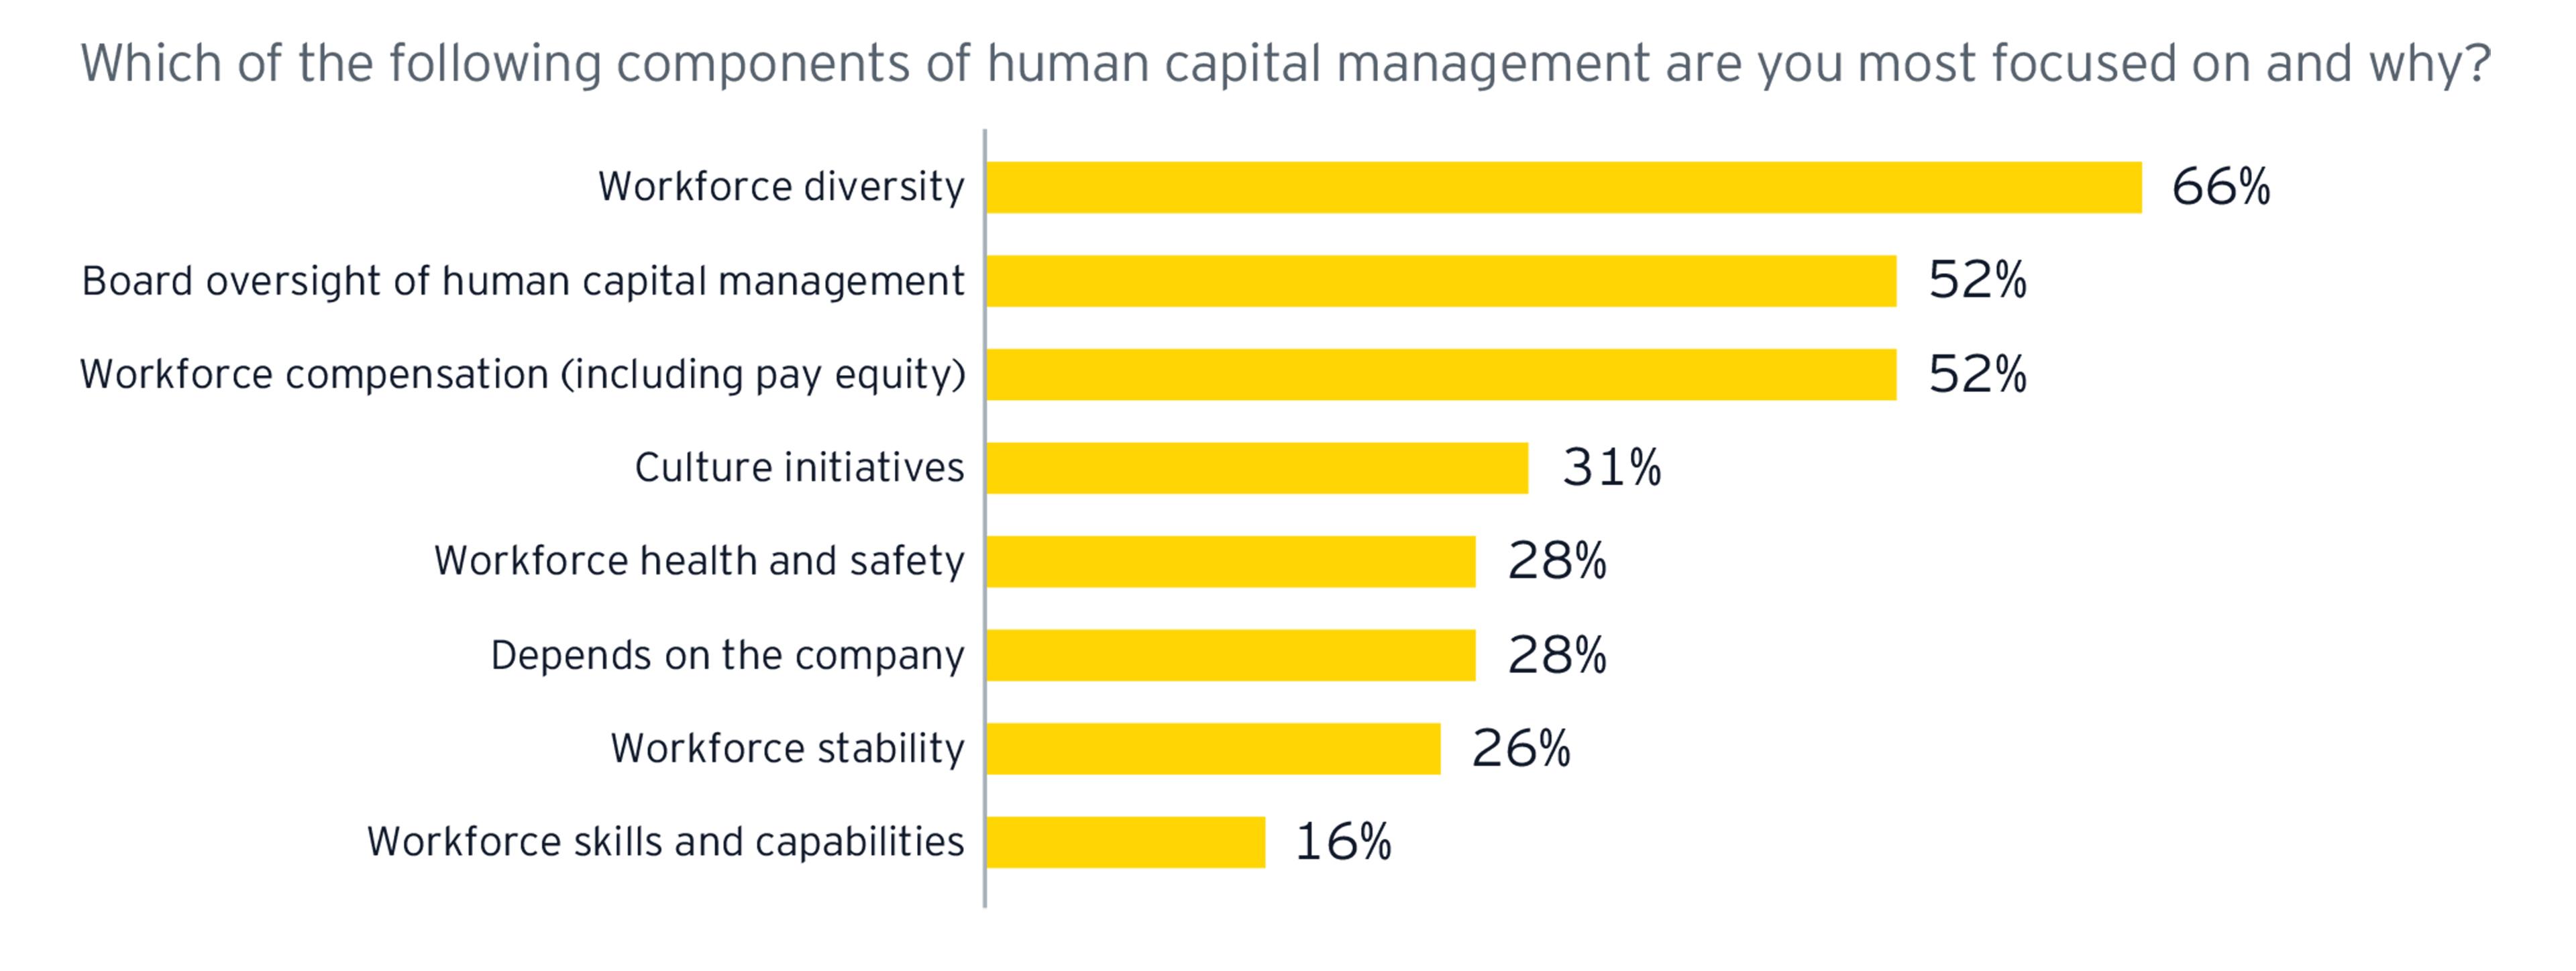 ey-focused-human-capital-management-2